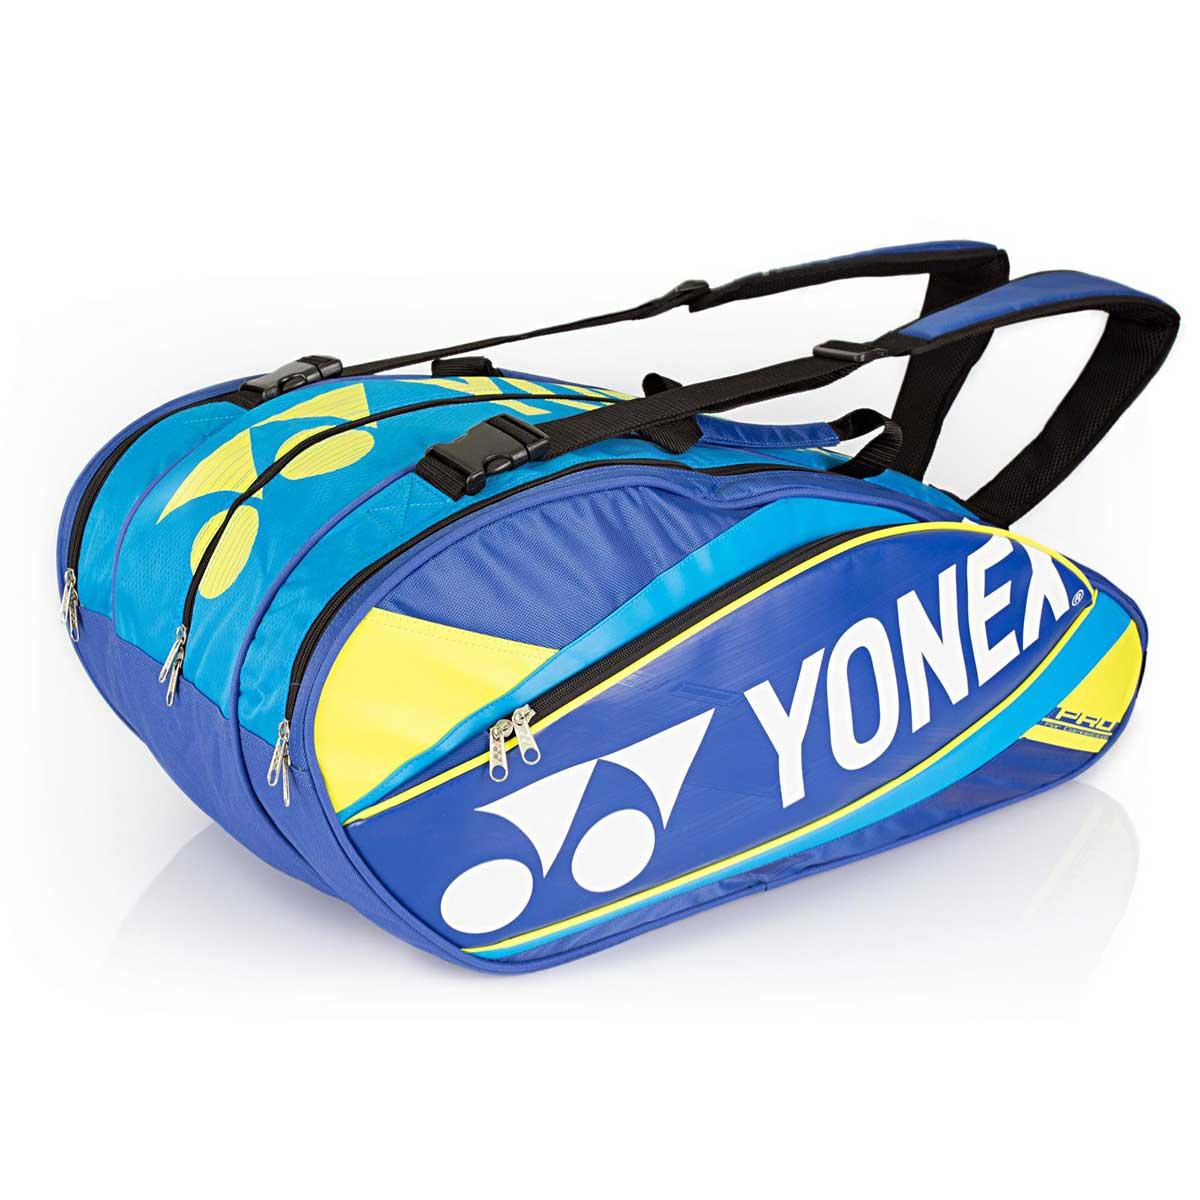 14e0b8ab3b3 Buy YONEX SUNR 9529TG BT9 Badminton Kit Bag (Blue) Online